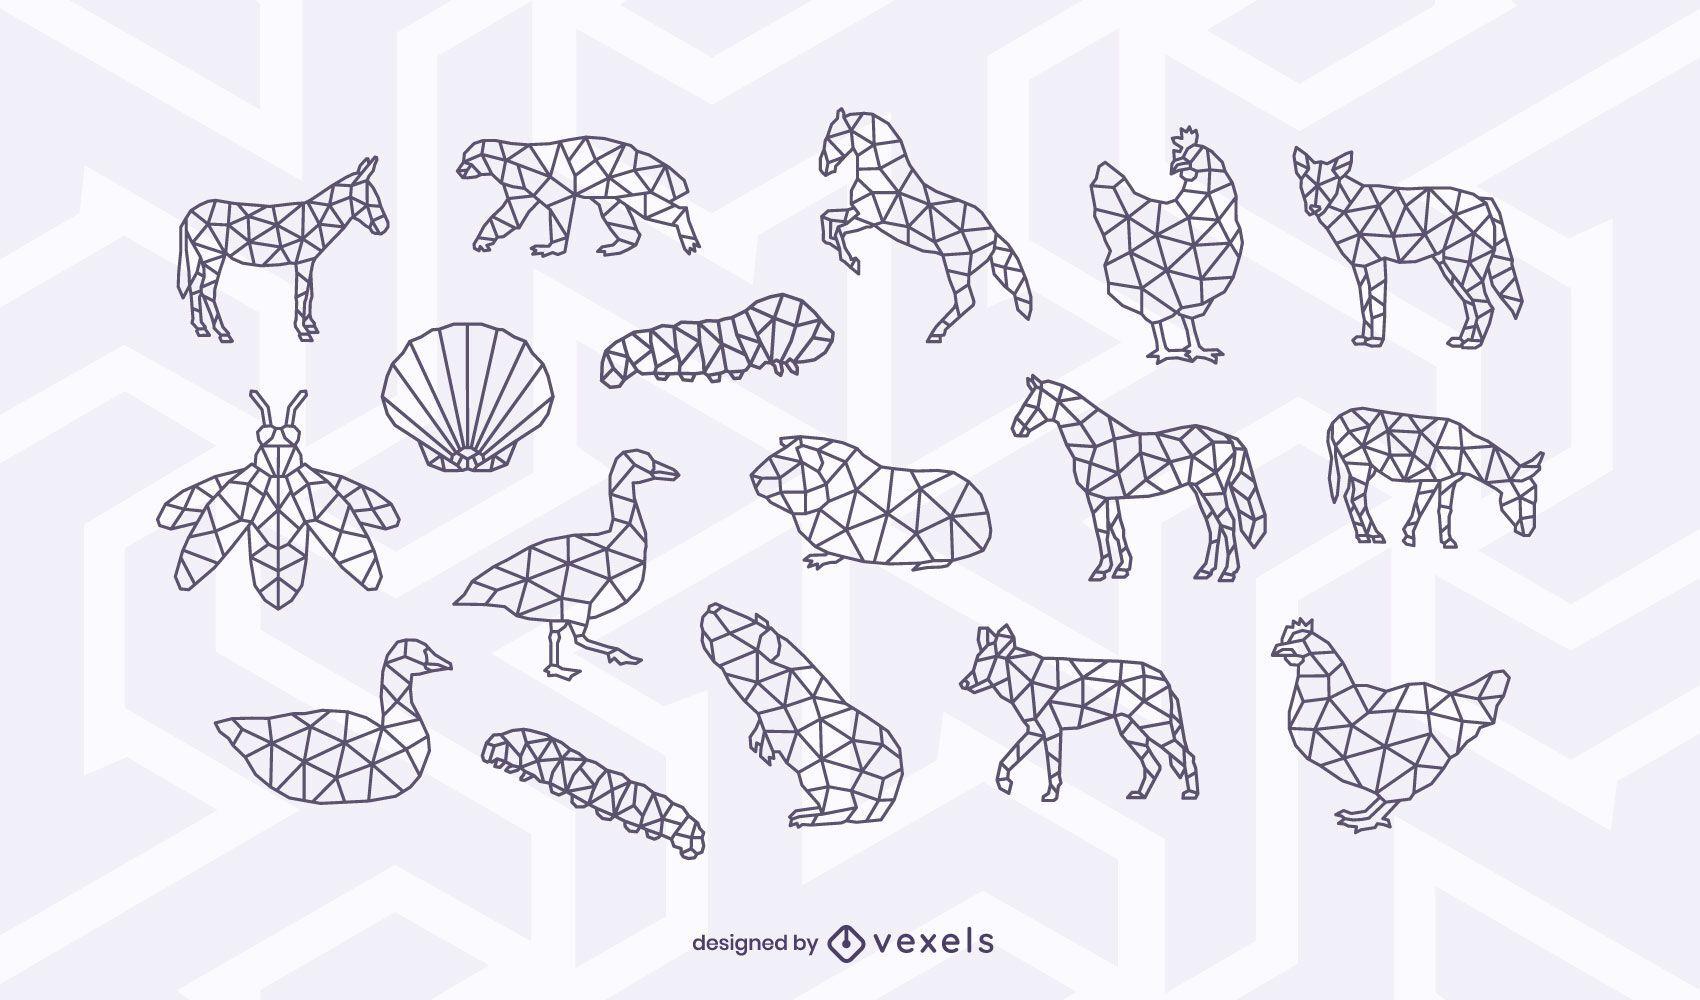 Polygonal animal stroke design set